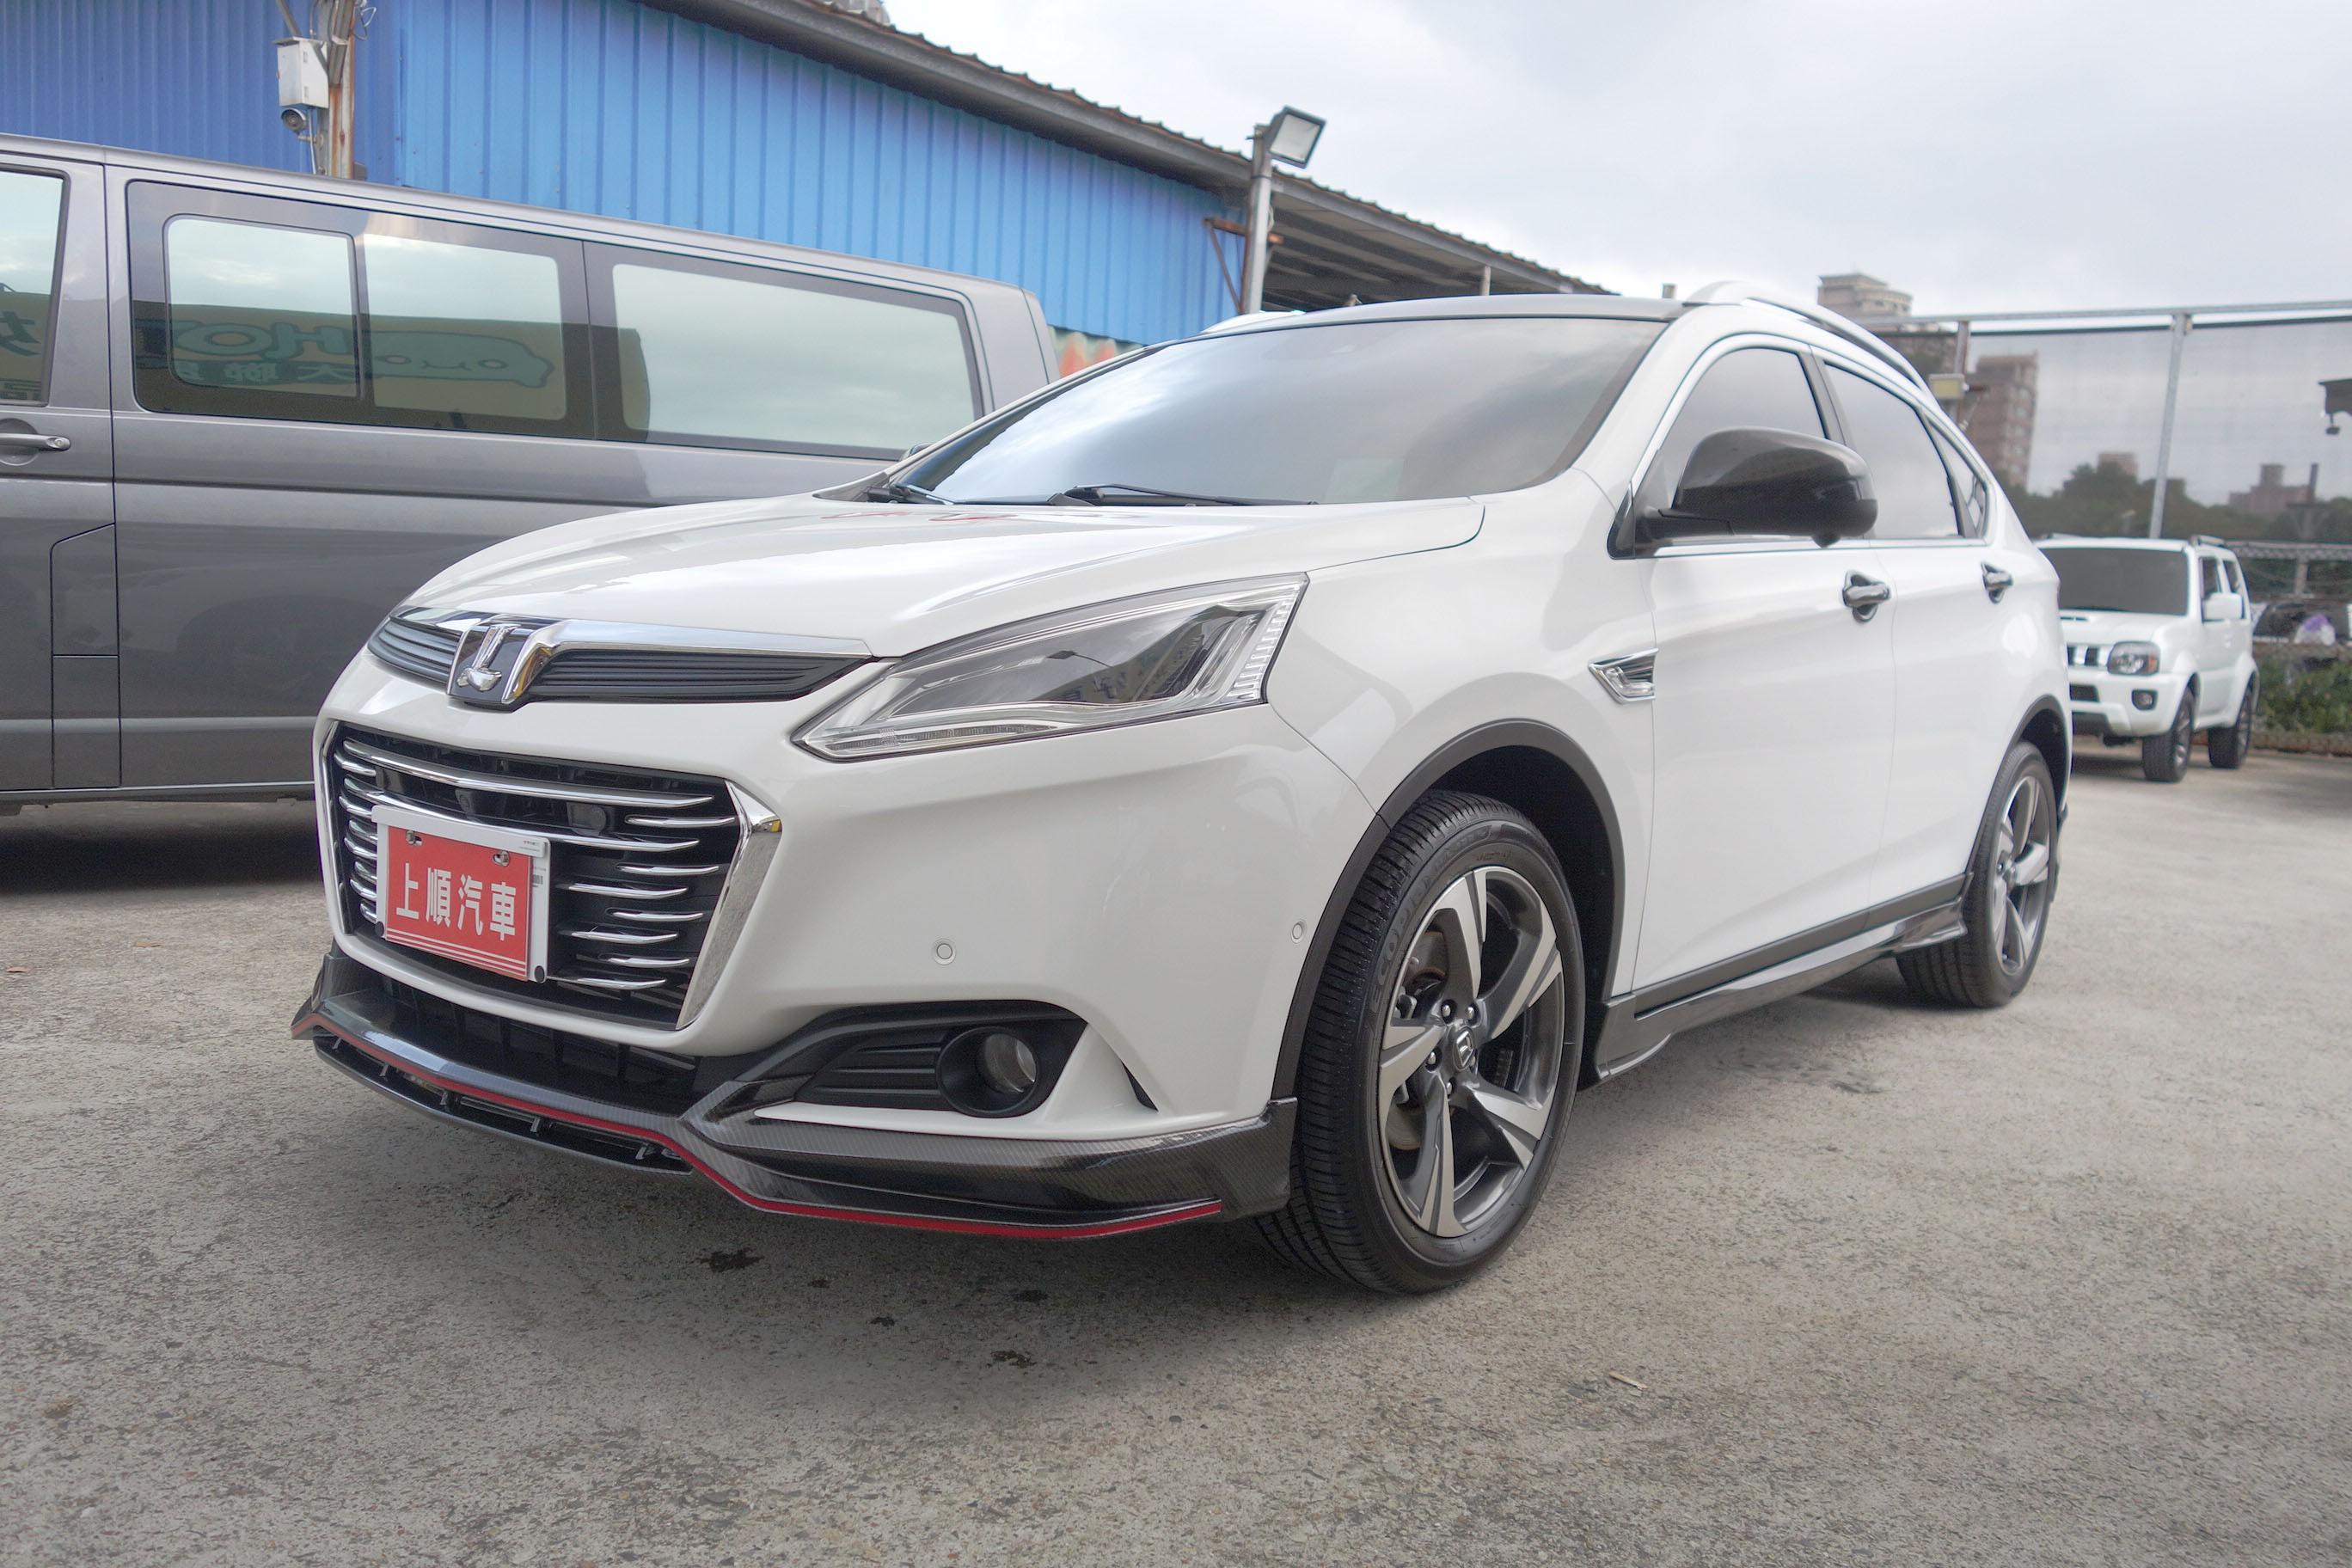 2019 Luxgen 納智捷 U6 turbo